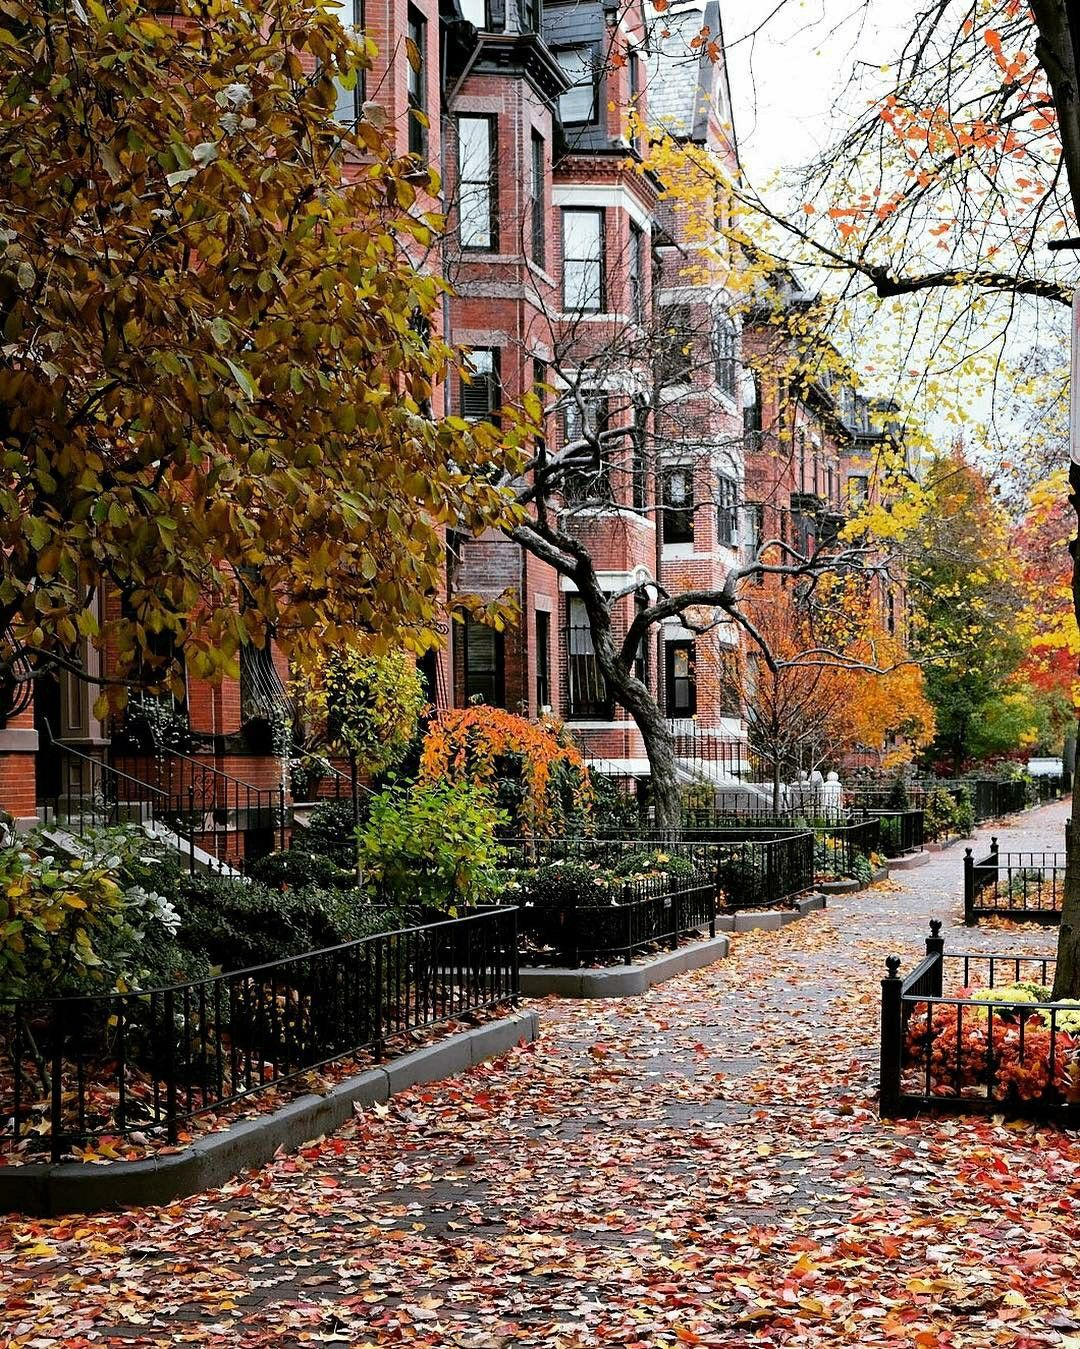 New York City Apartment Streets: Autumn Scenery, Fall City, Autumn